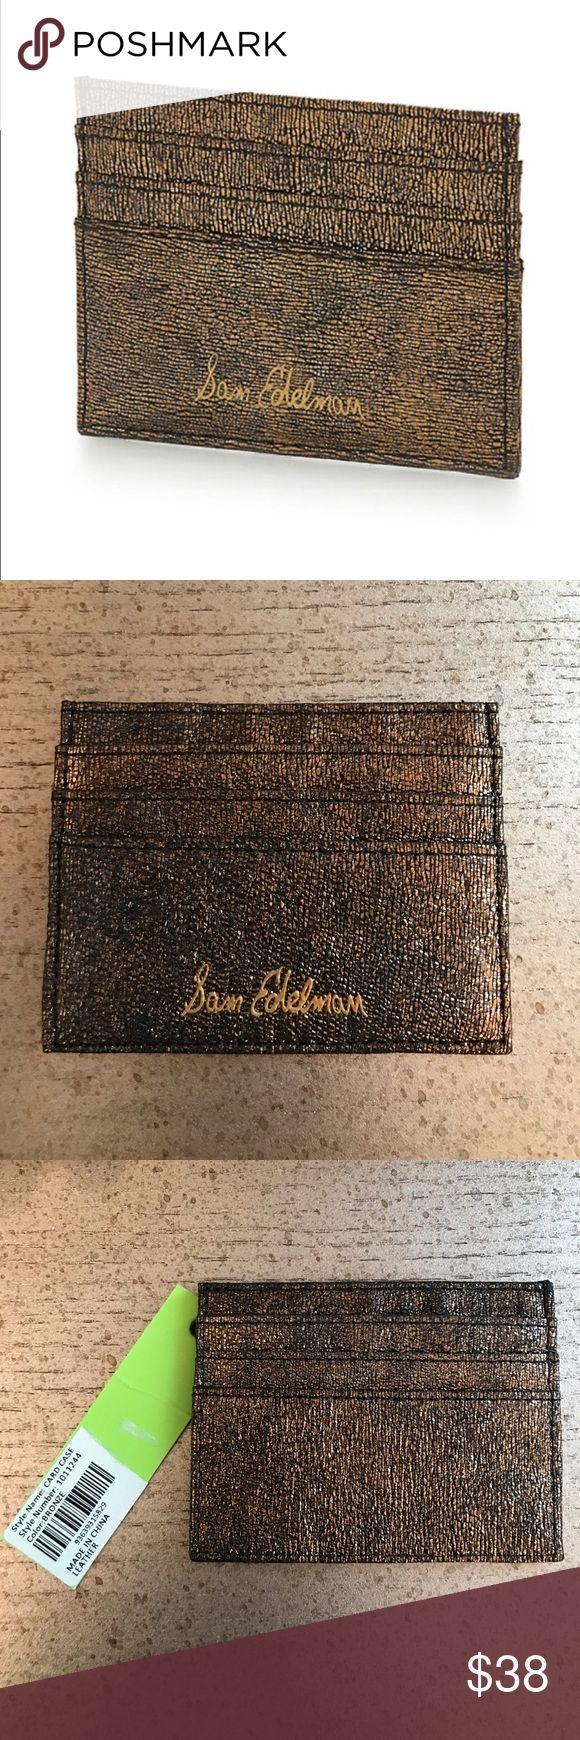 Sam Edelman Metallic Leather Credit Card Case Never used. Has original tags Sam Edelman Accessories Key & Card Holders